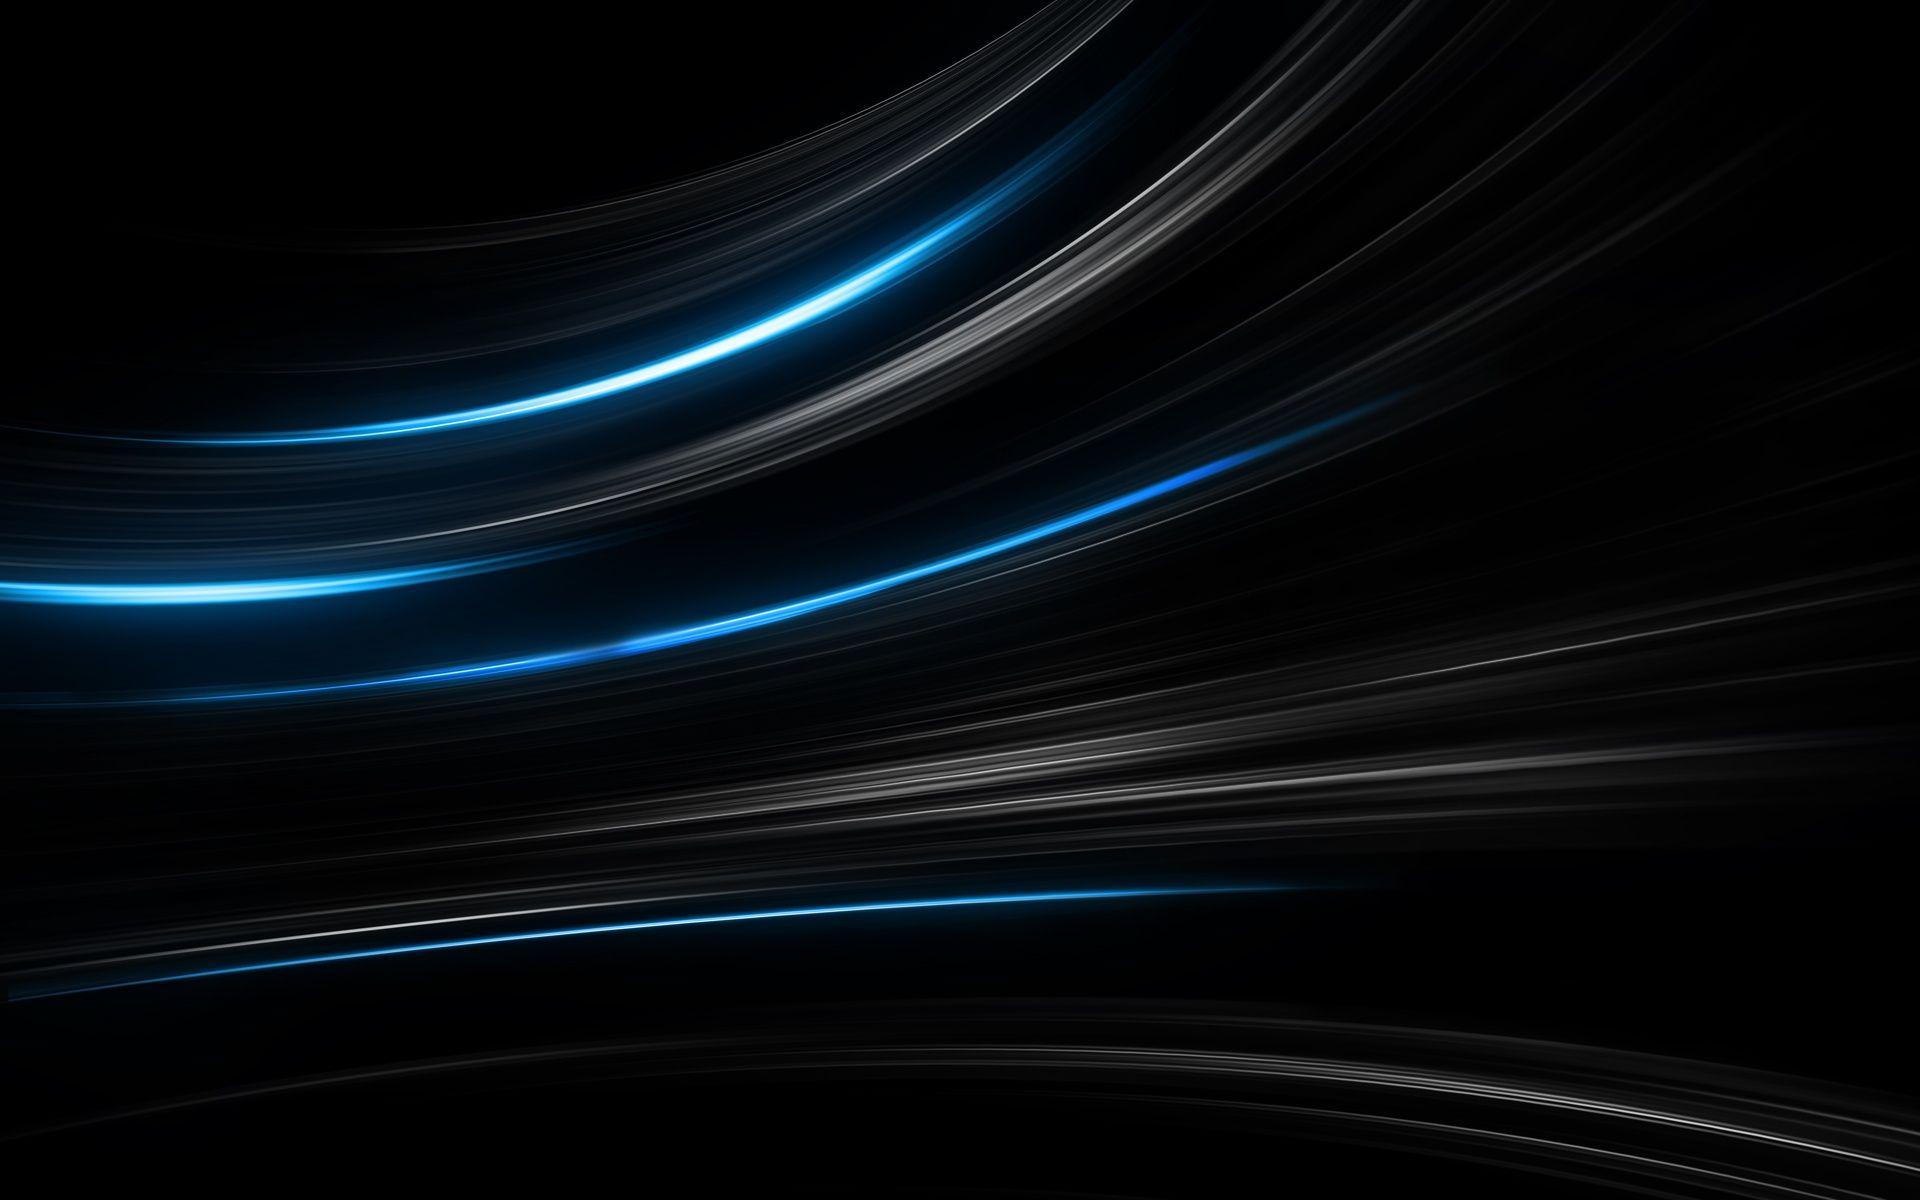 Flow Glow Hd Wallpaper Black And Blue Wallpaper Dark Blue Wallpaper Blue Wallpapers